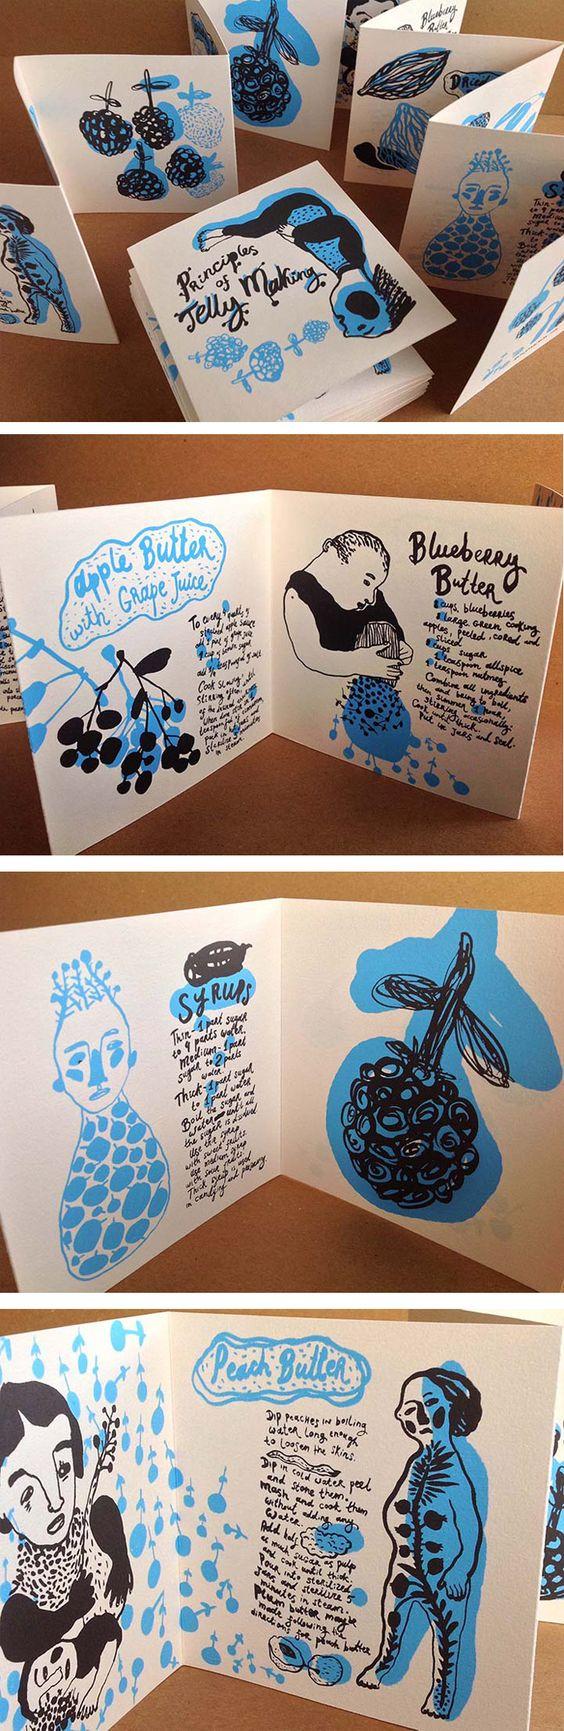 Natalya Balnova / Silk screened book design - Principles of Jelly Making. http://www.designworklife.com/2014/04/17/alliteration-inspiration-jelly-journeying/: